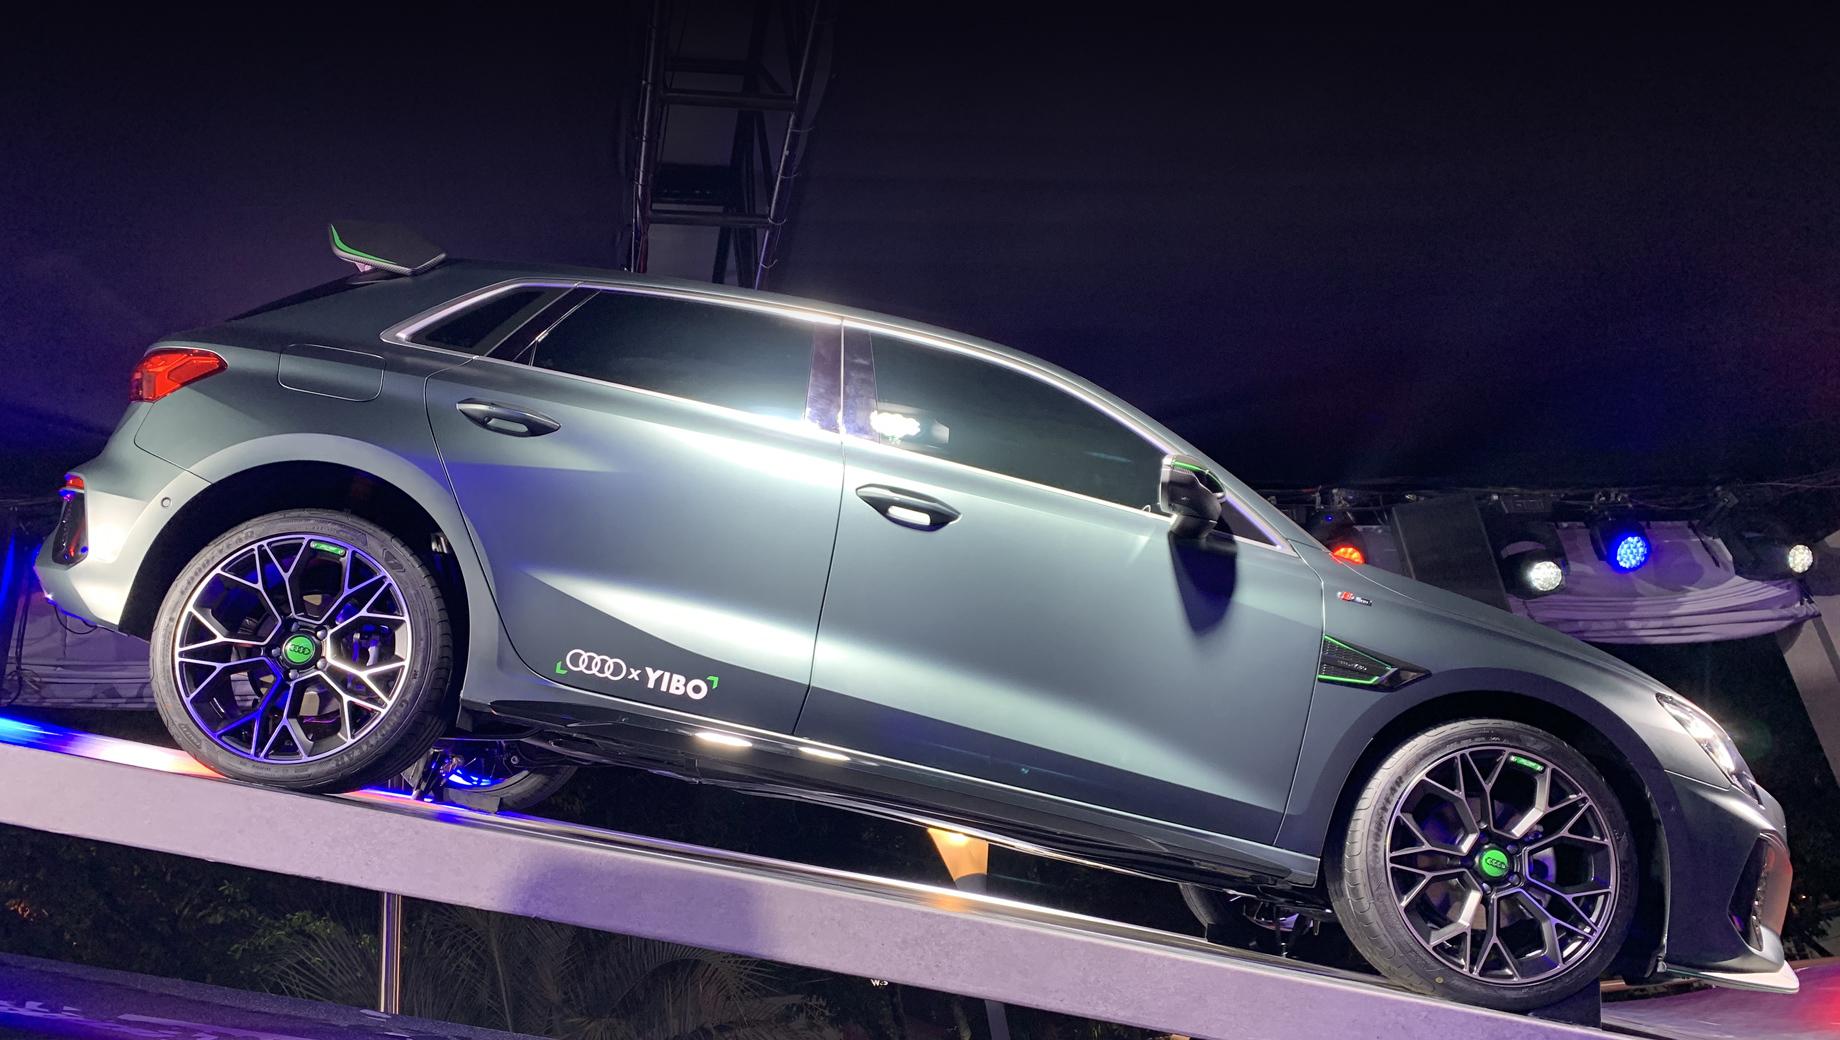 Хэтчбек Audi A3 Wang Yibo сделал ставку на дизайн